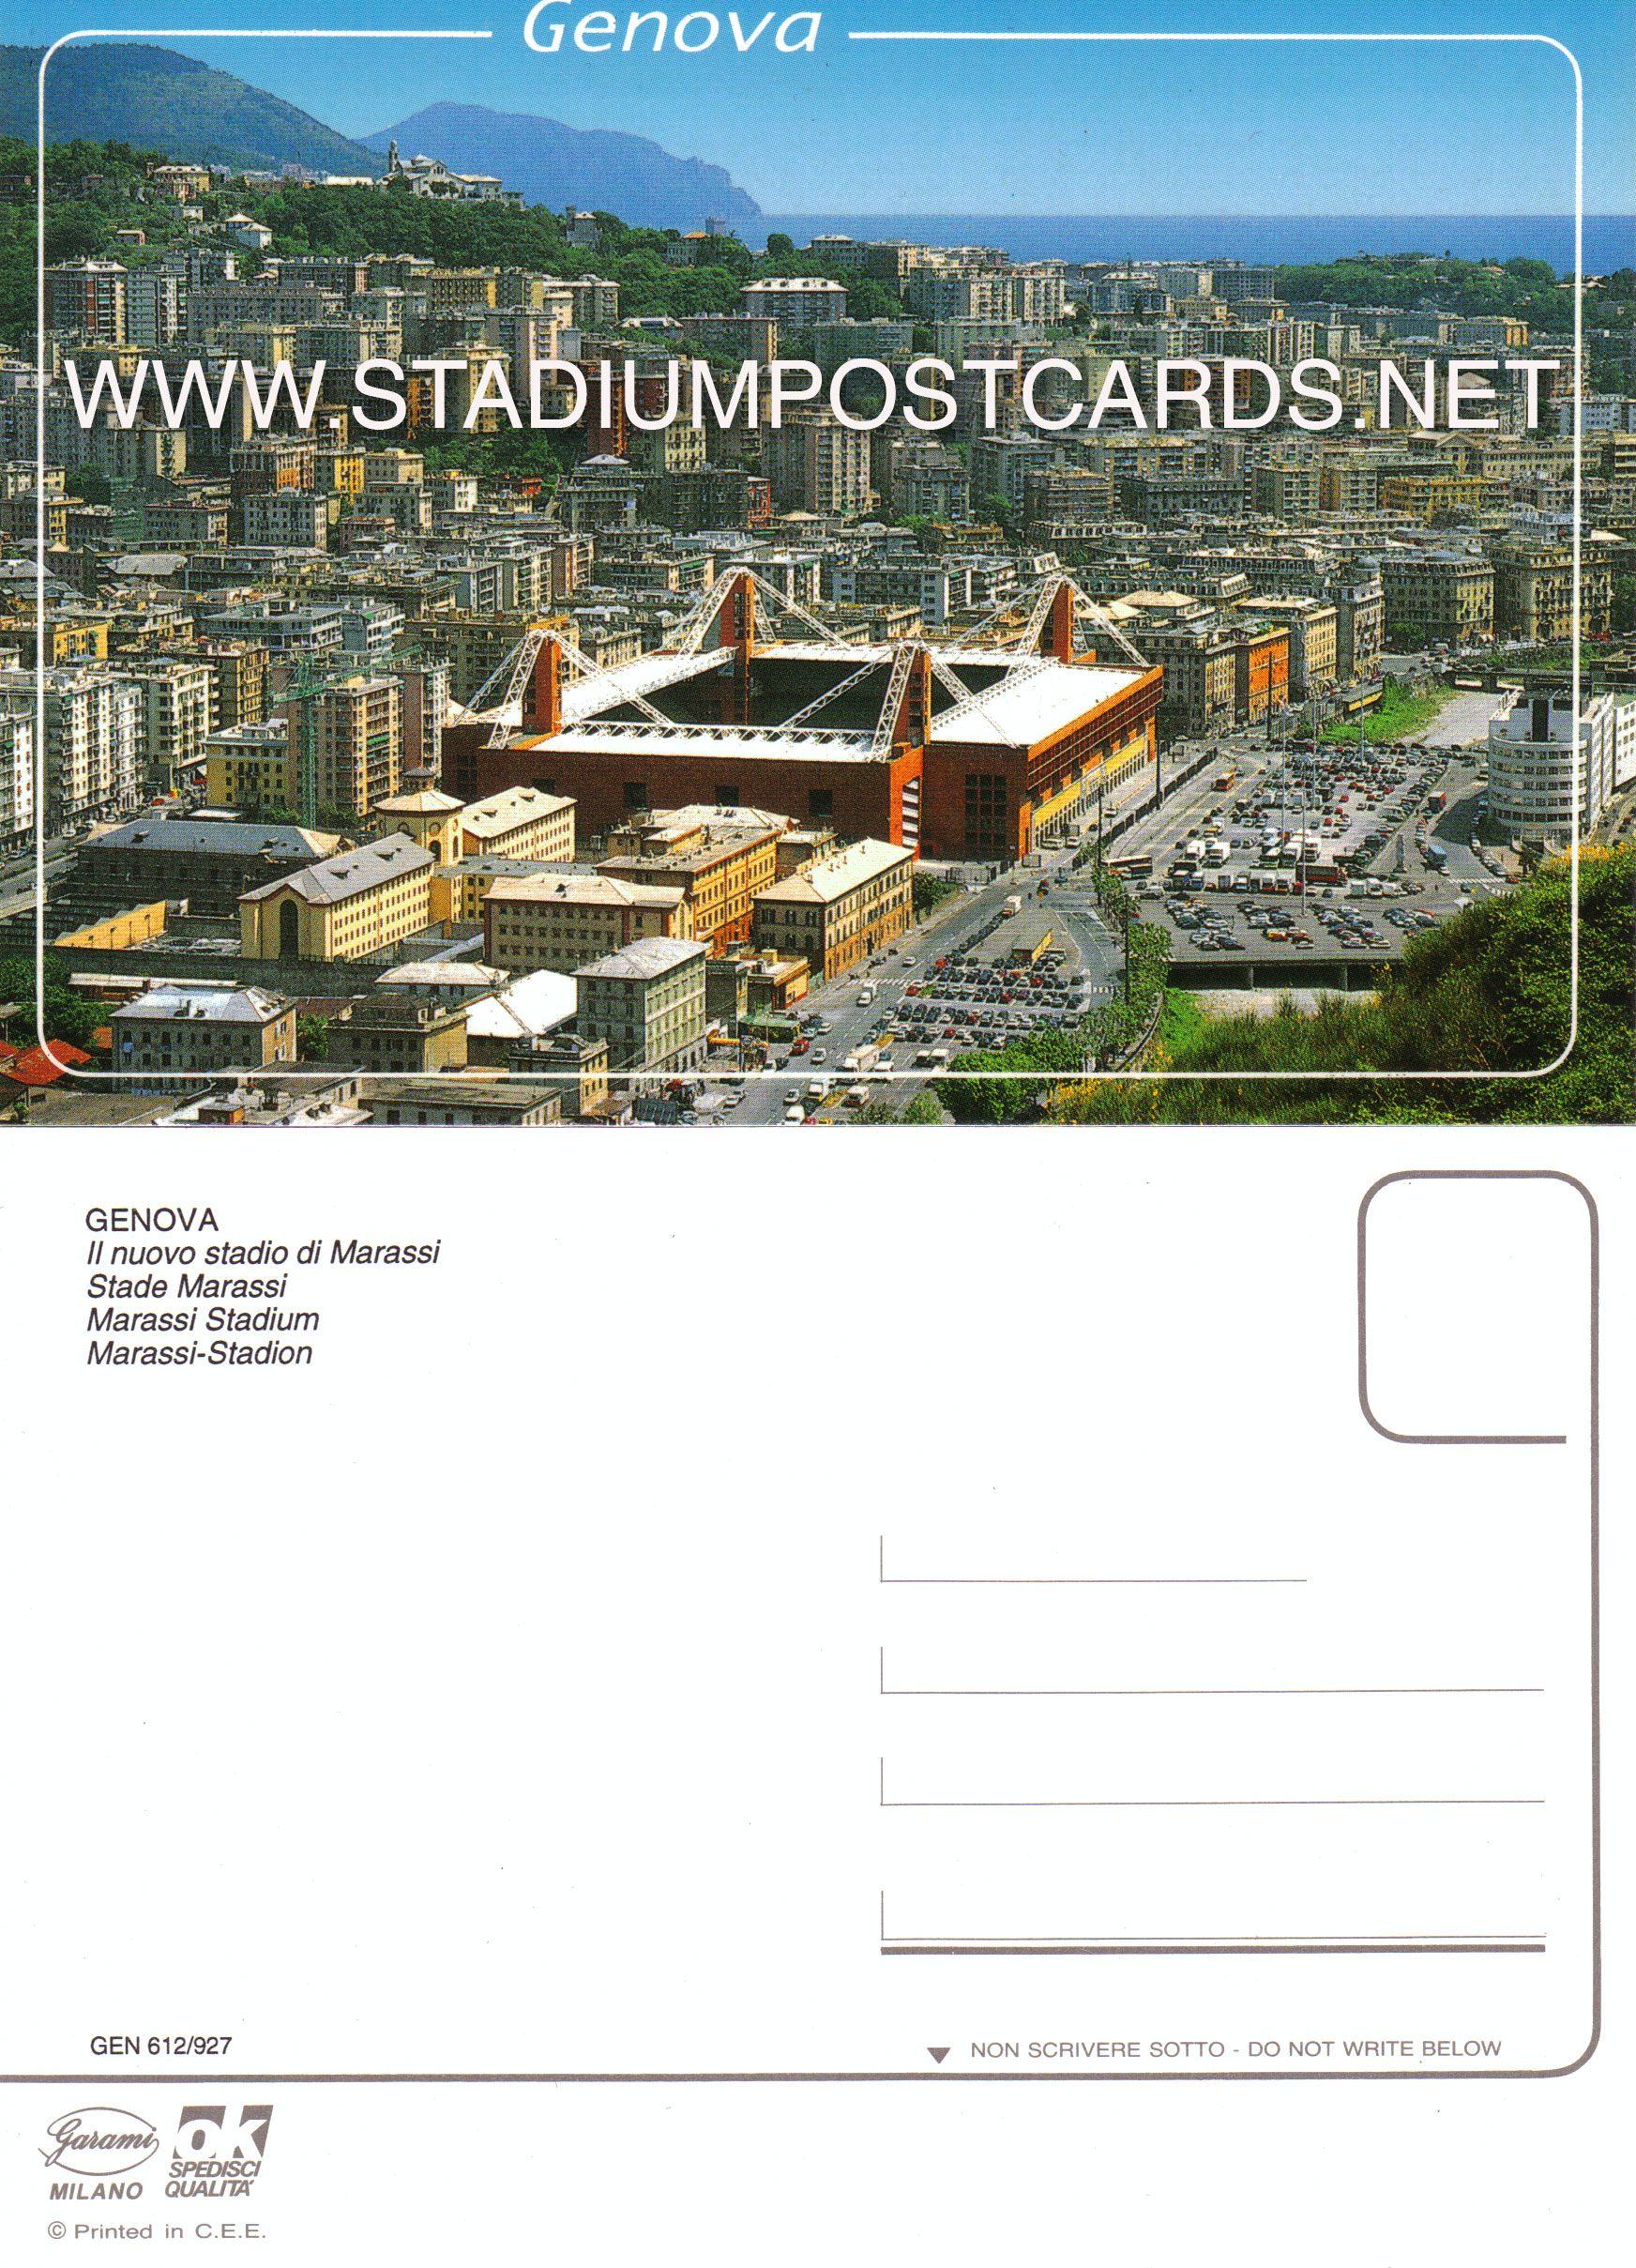 € 0,90 - code : ITA-017 - Genova - Ferraris - stadium postcard cartolina stadio carte stade estadio tarjeta postal